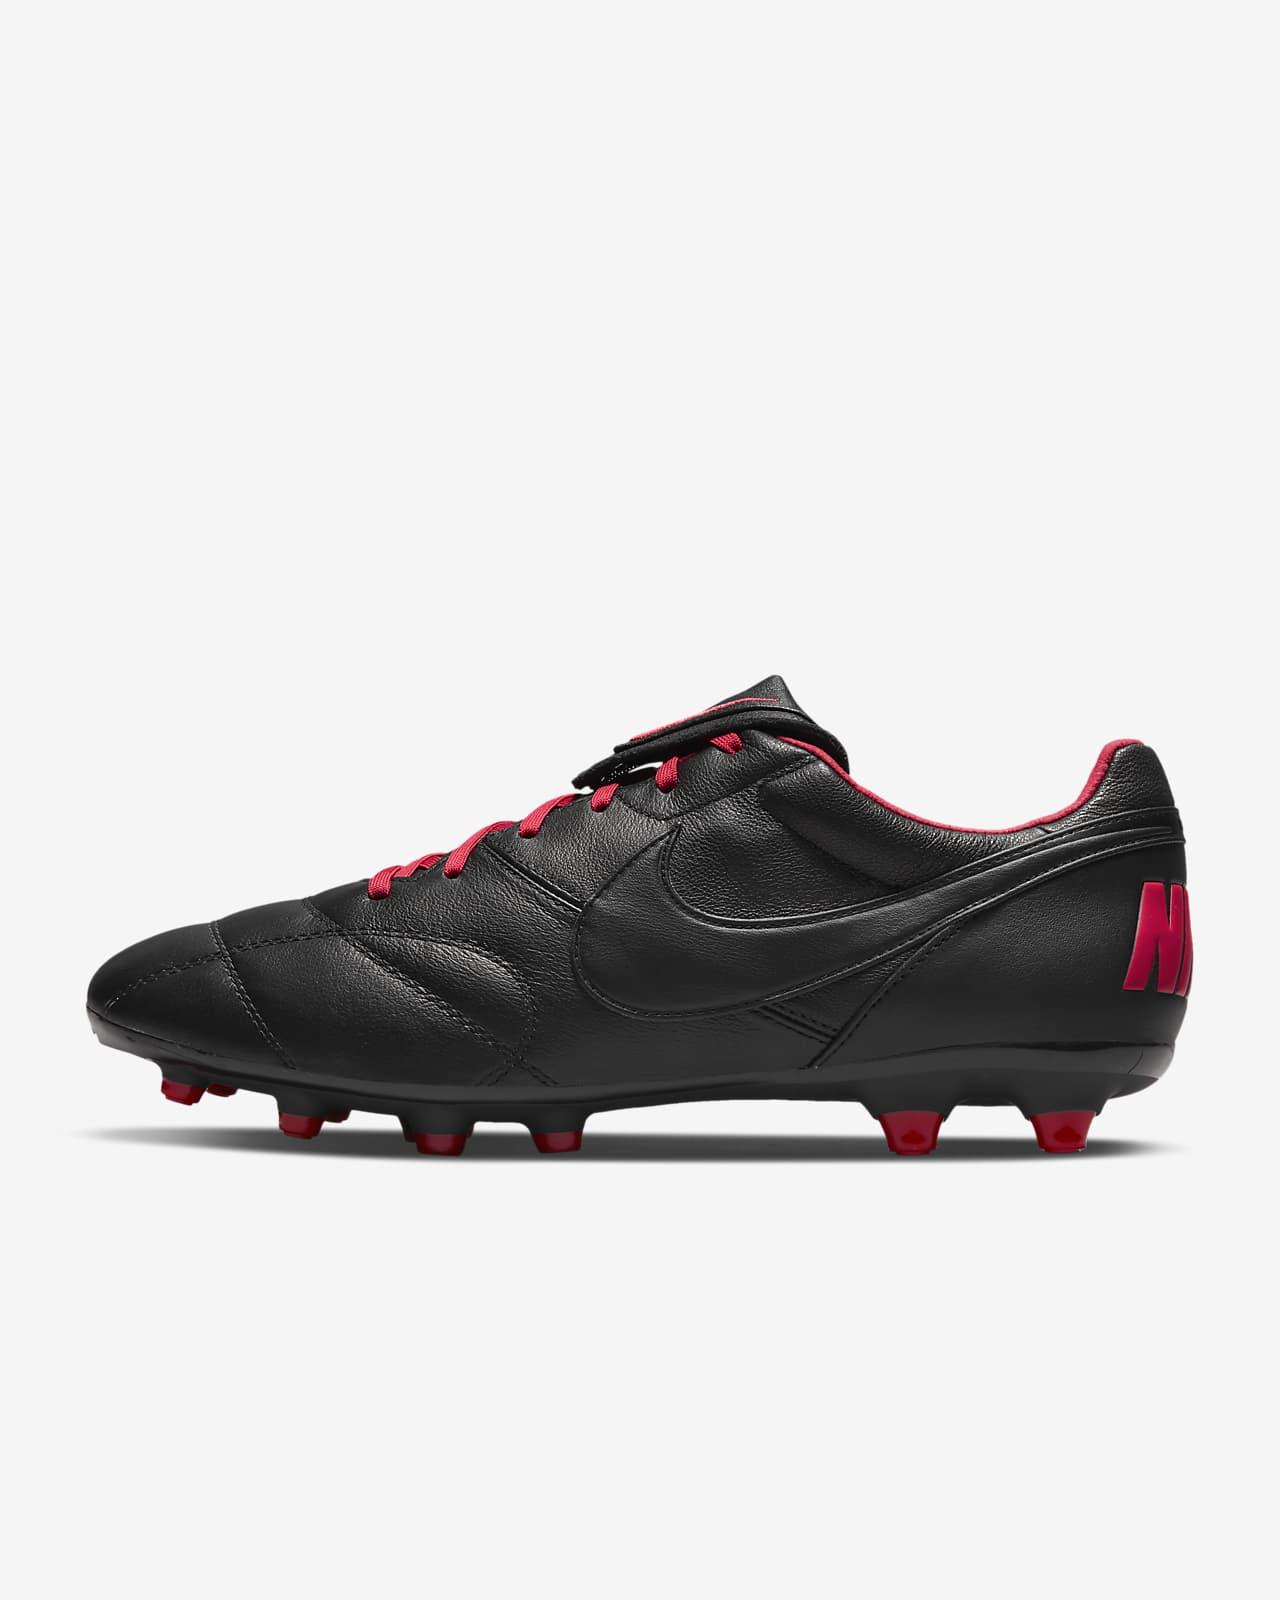 Nike Premier II FG Botas de fútbol para terreno firme